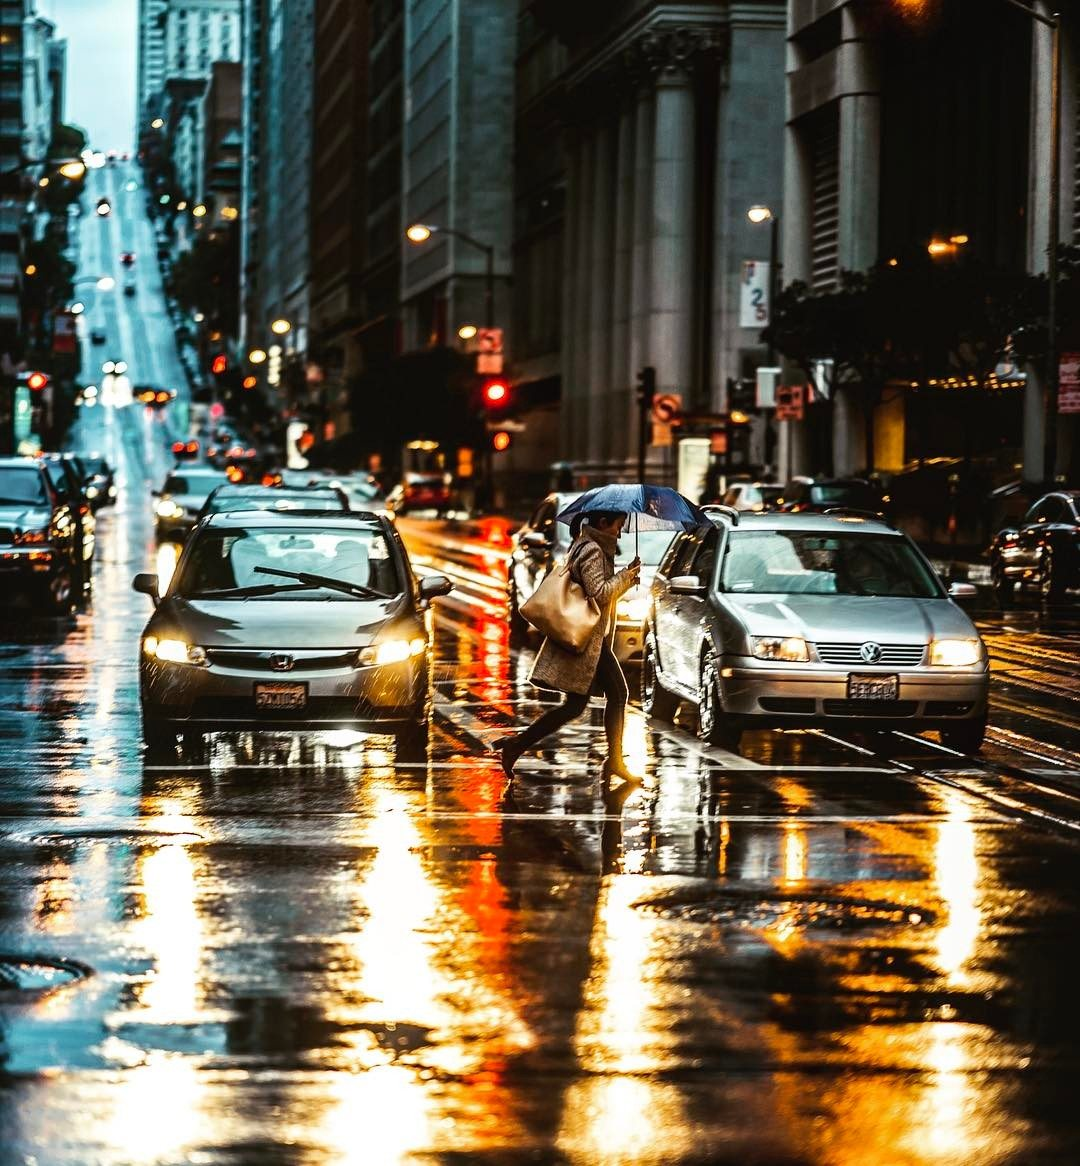 The rain won't stop us. Photo: j.carlosimages.